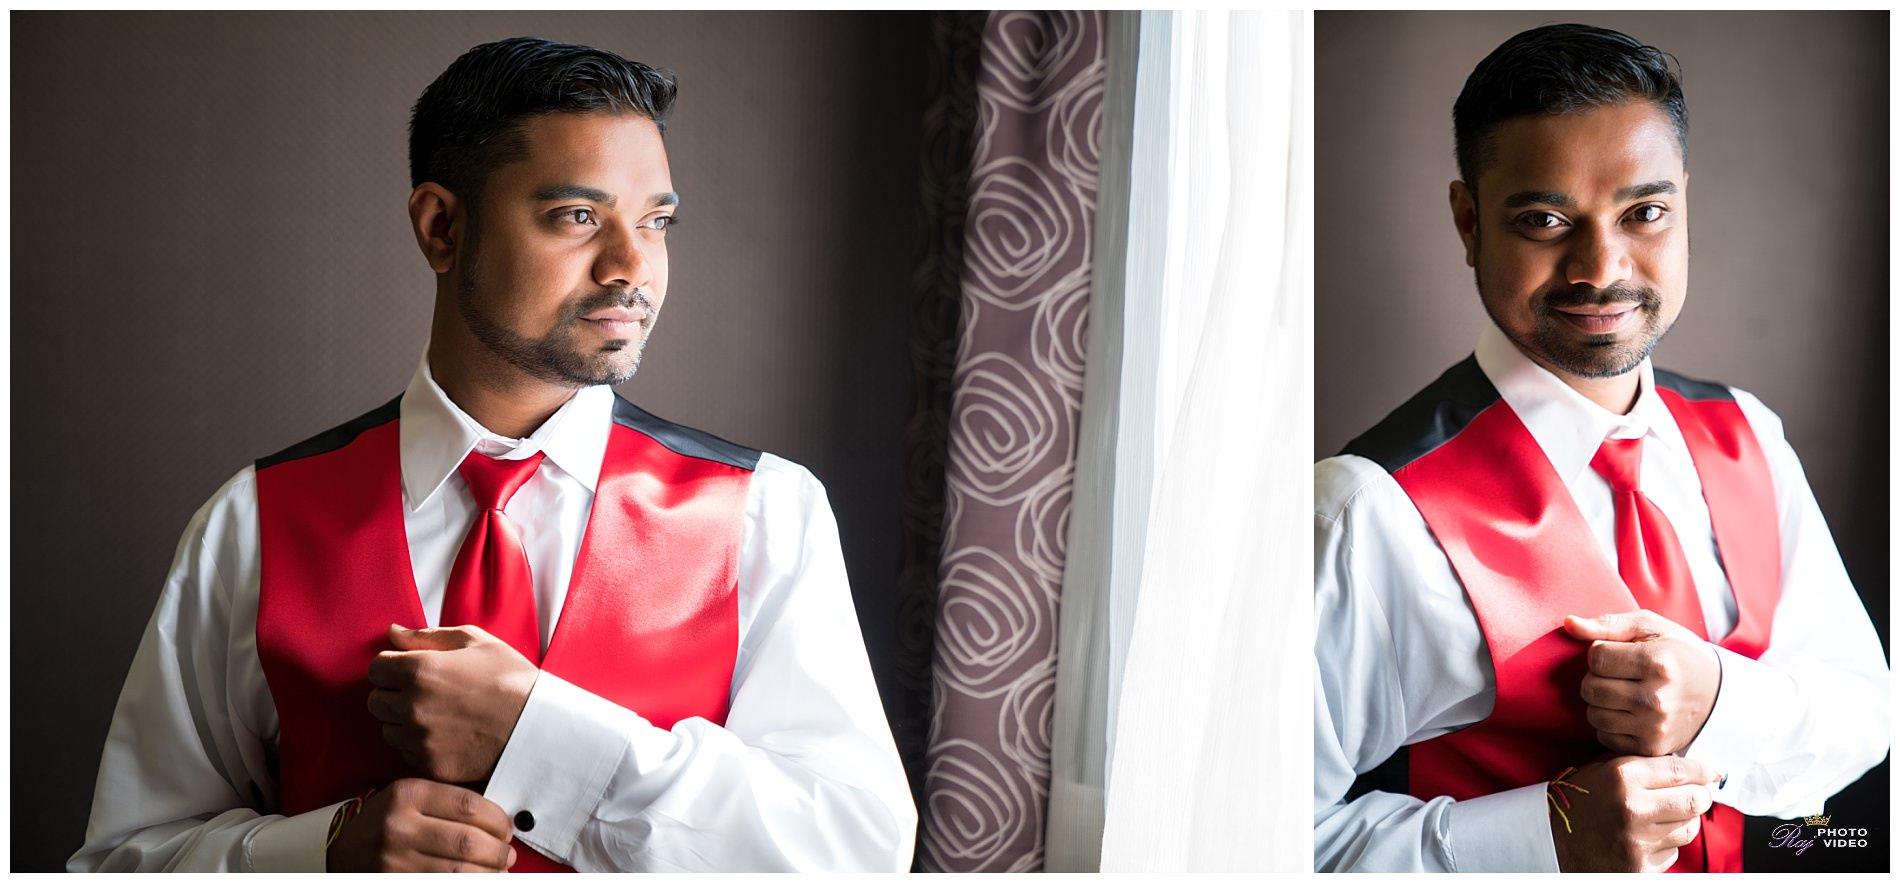 doubletree-by-hilton-hotel-wilmington-de-wedding-krishna-ritesh-74.jpg